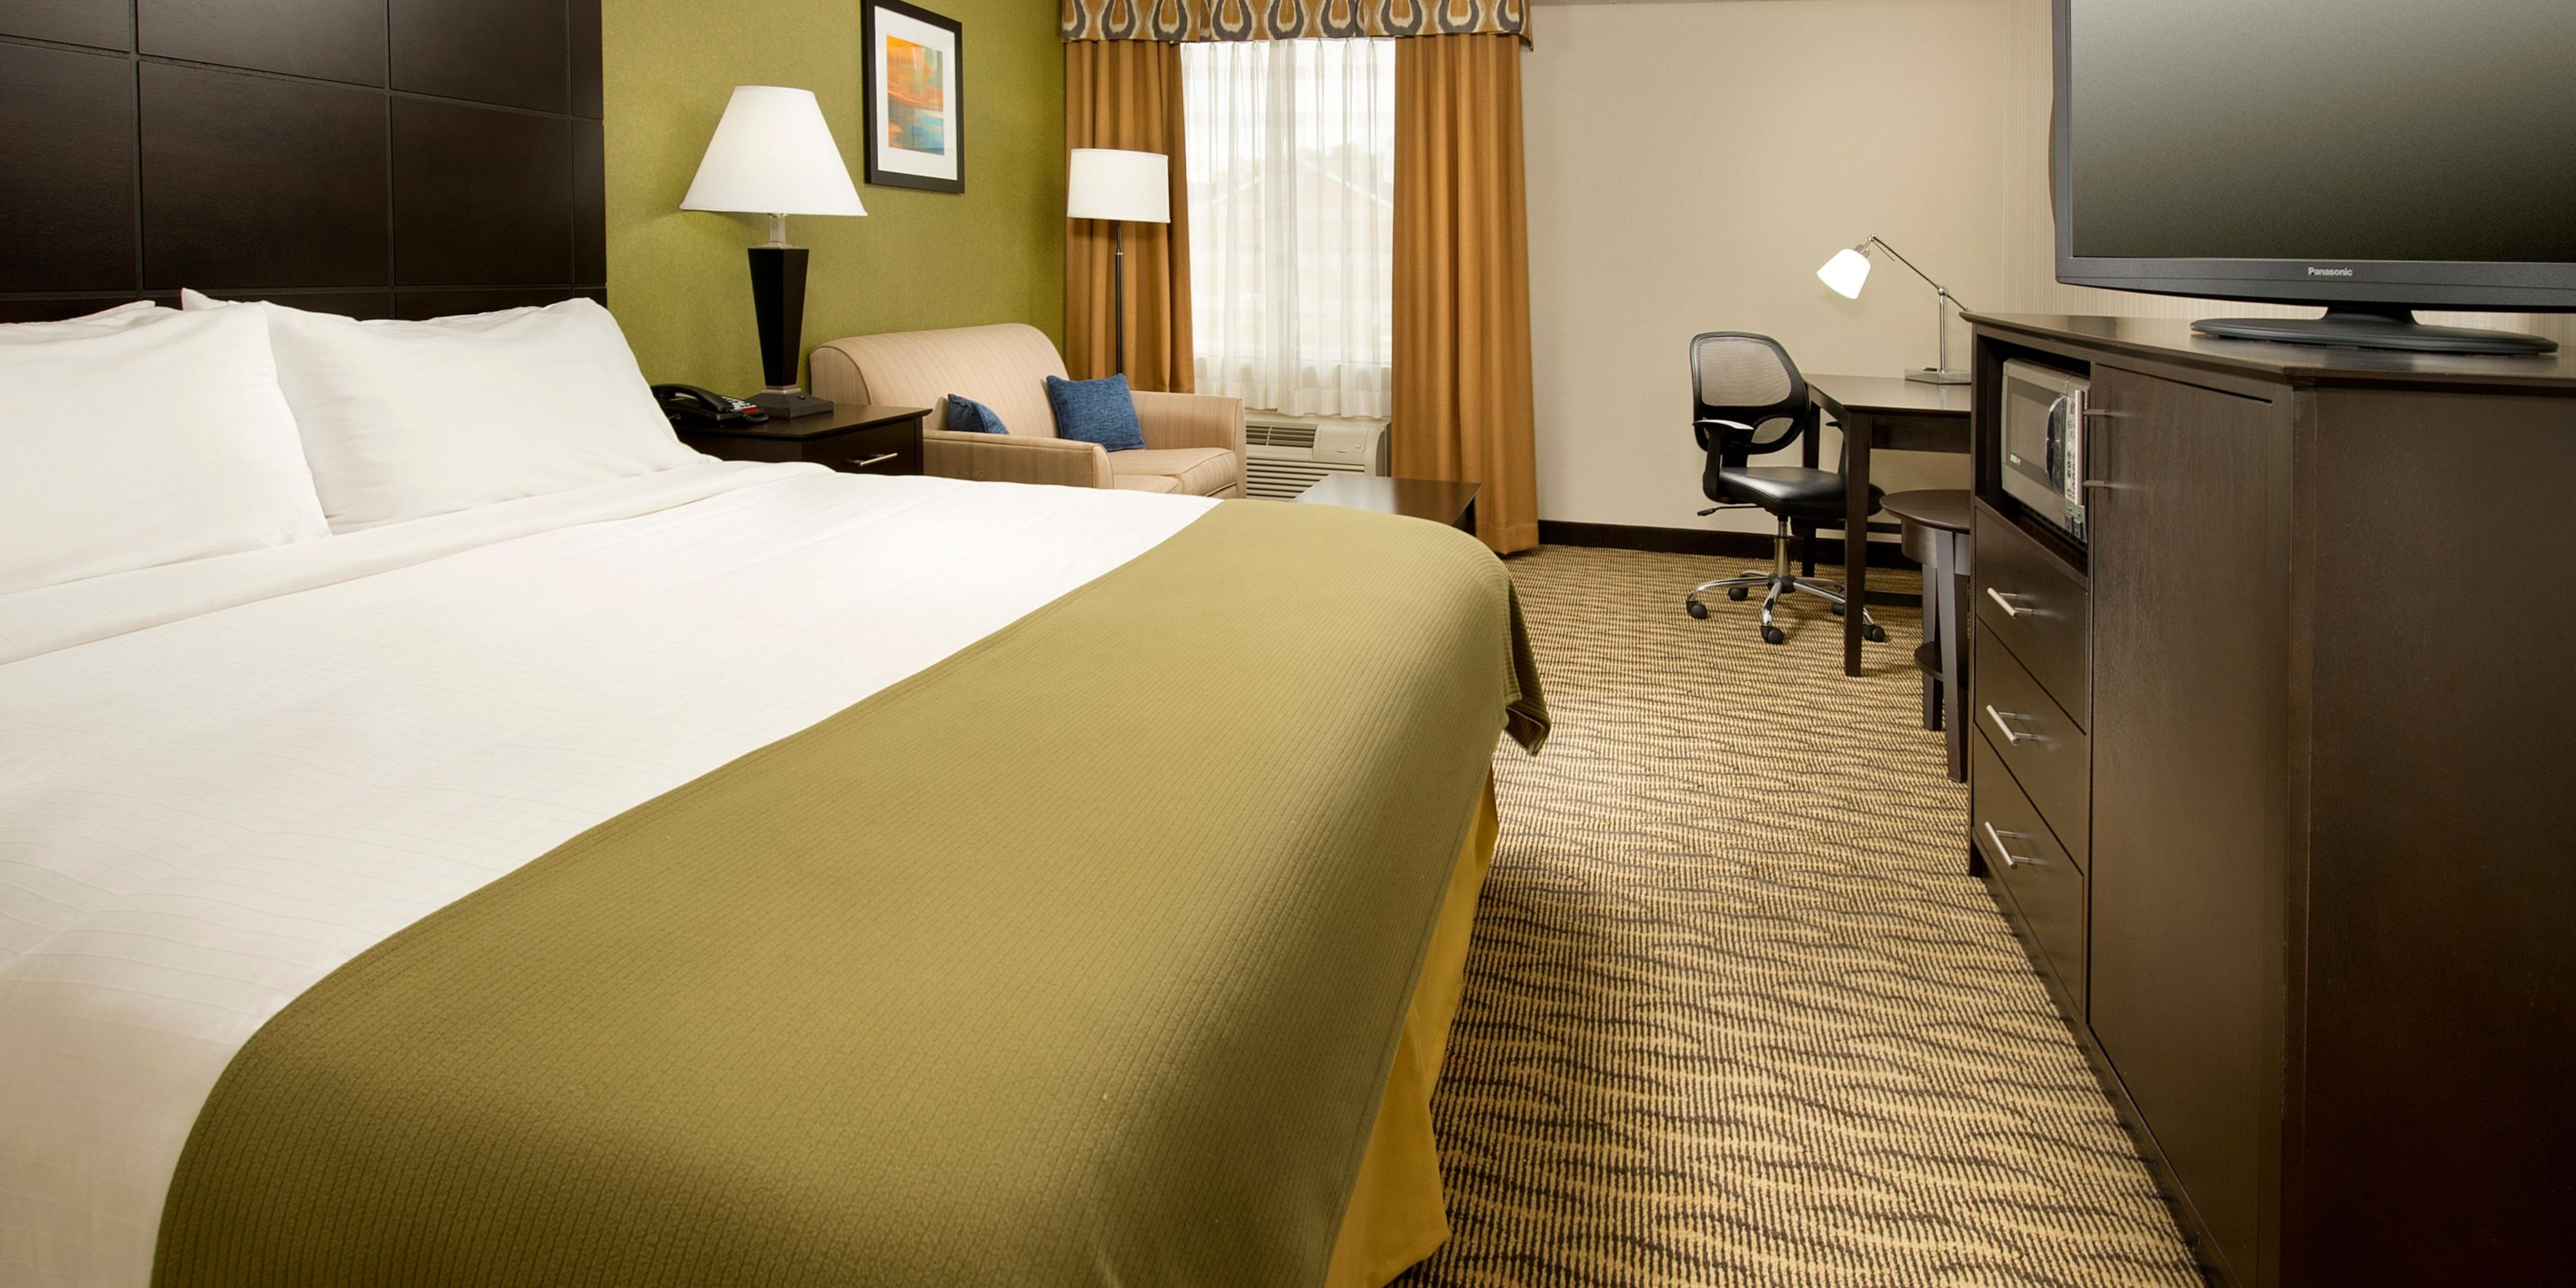 Holiday Inn Express Waldorf 2532324145 2x1